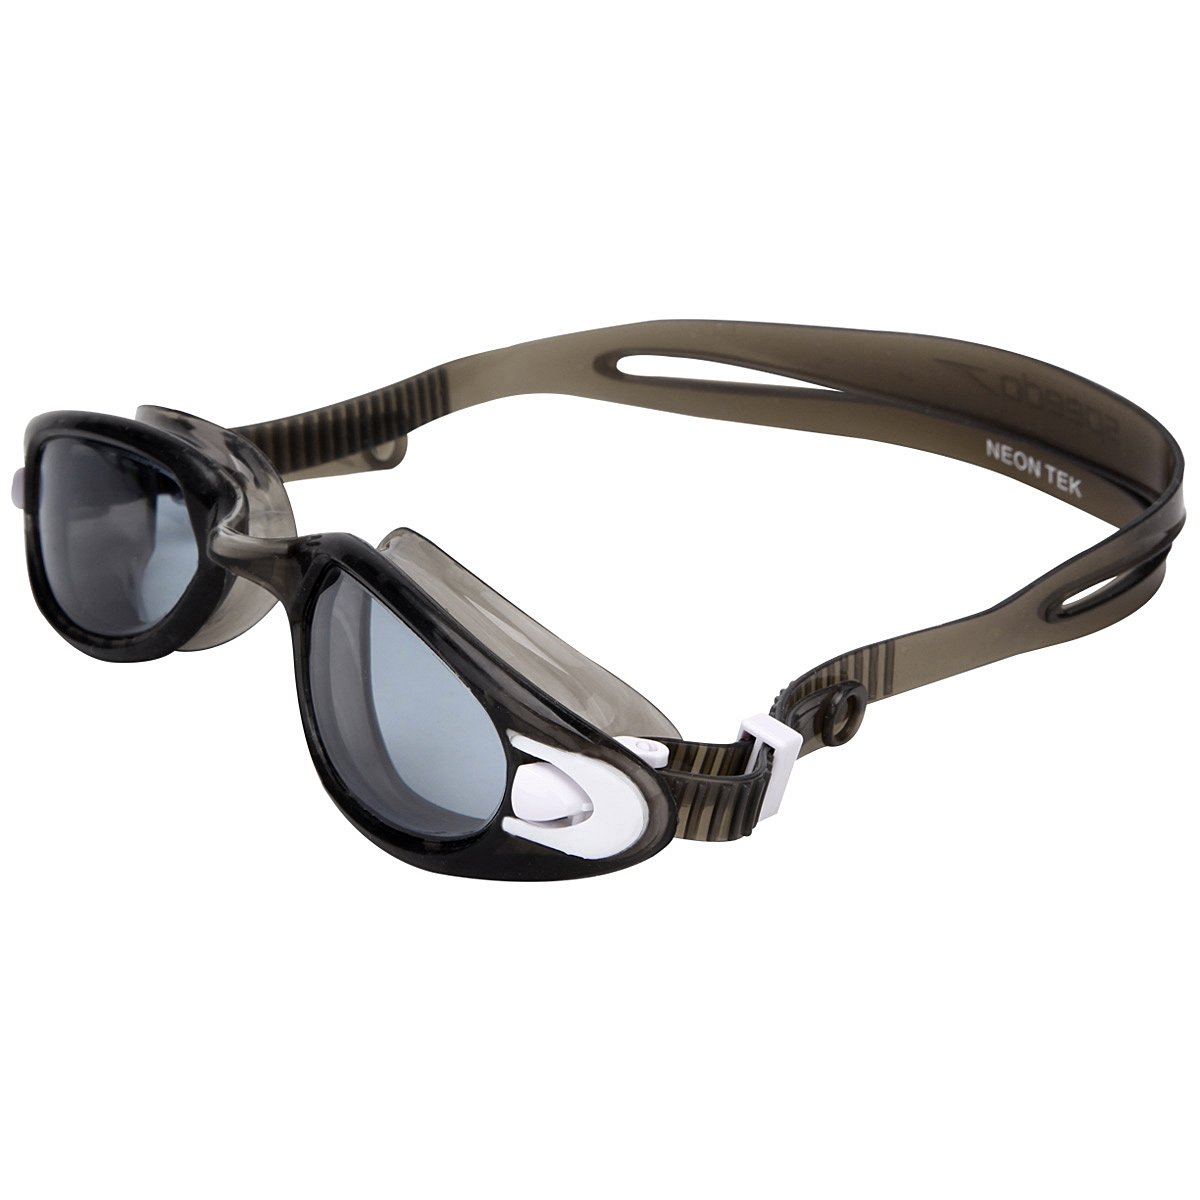 Óculos Speedo Neon Tek